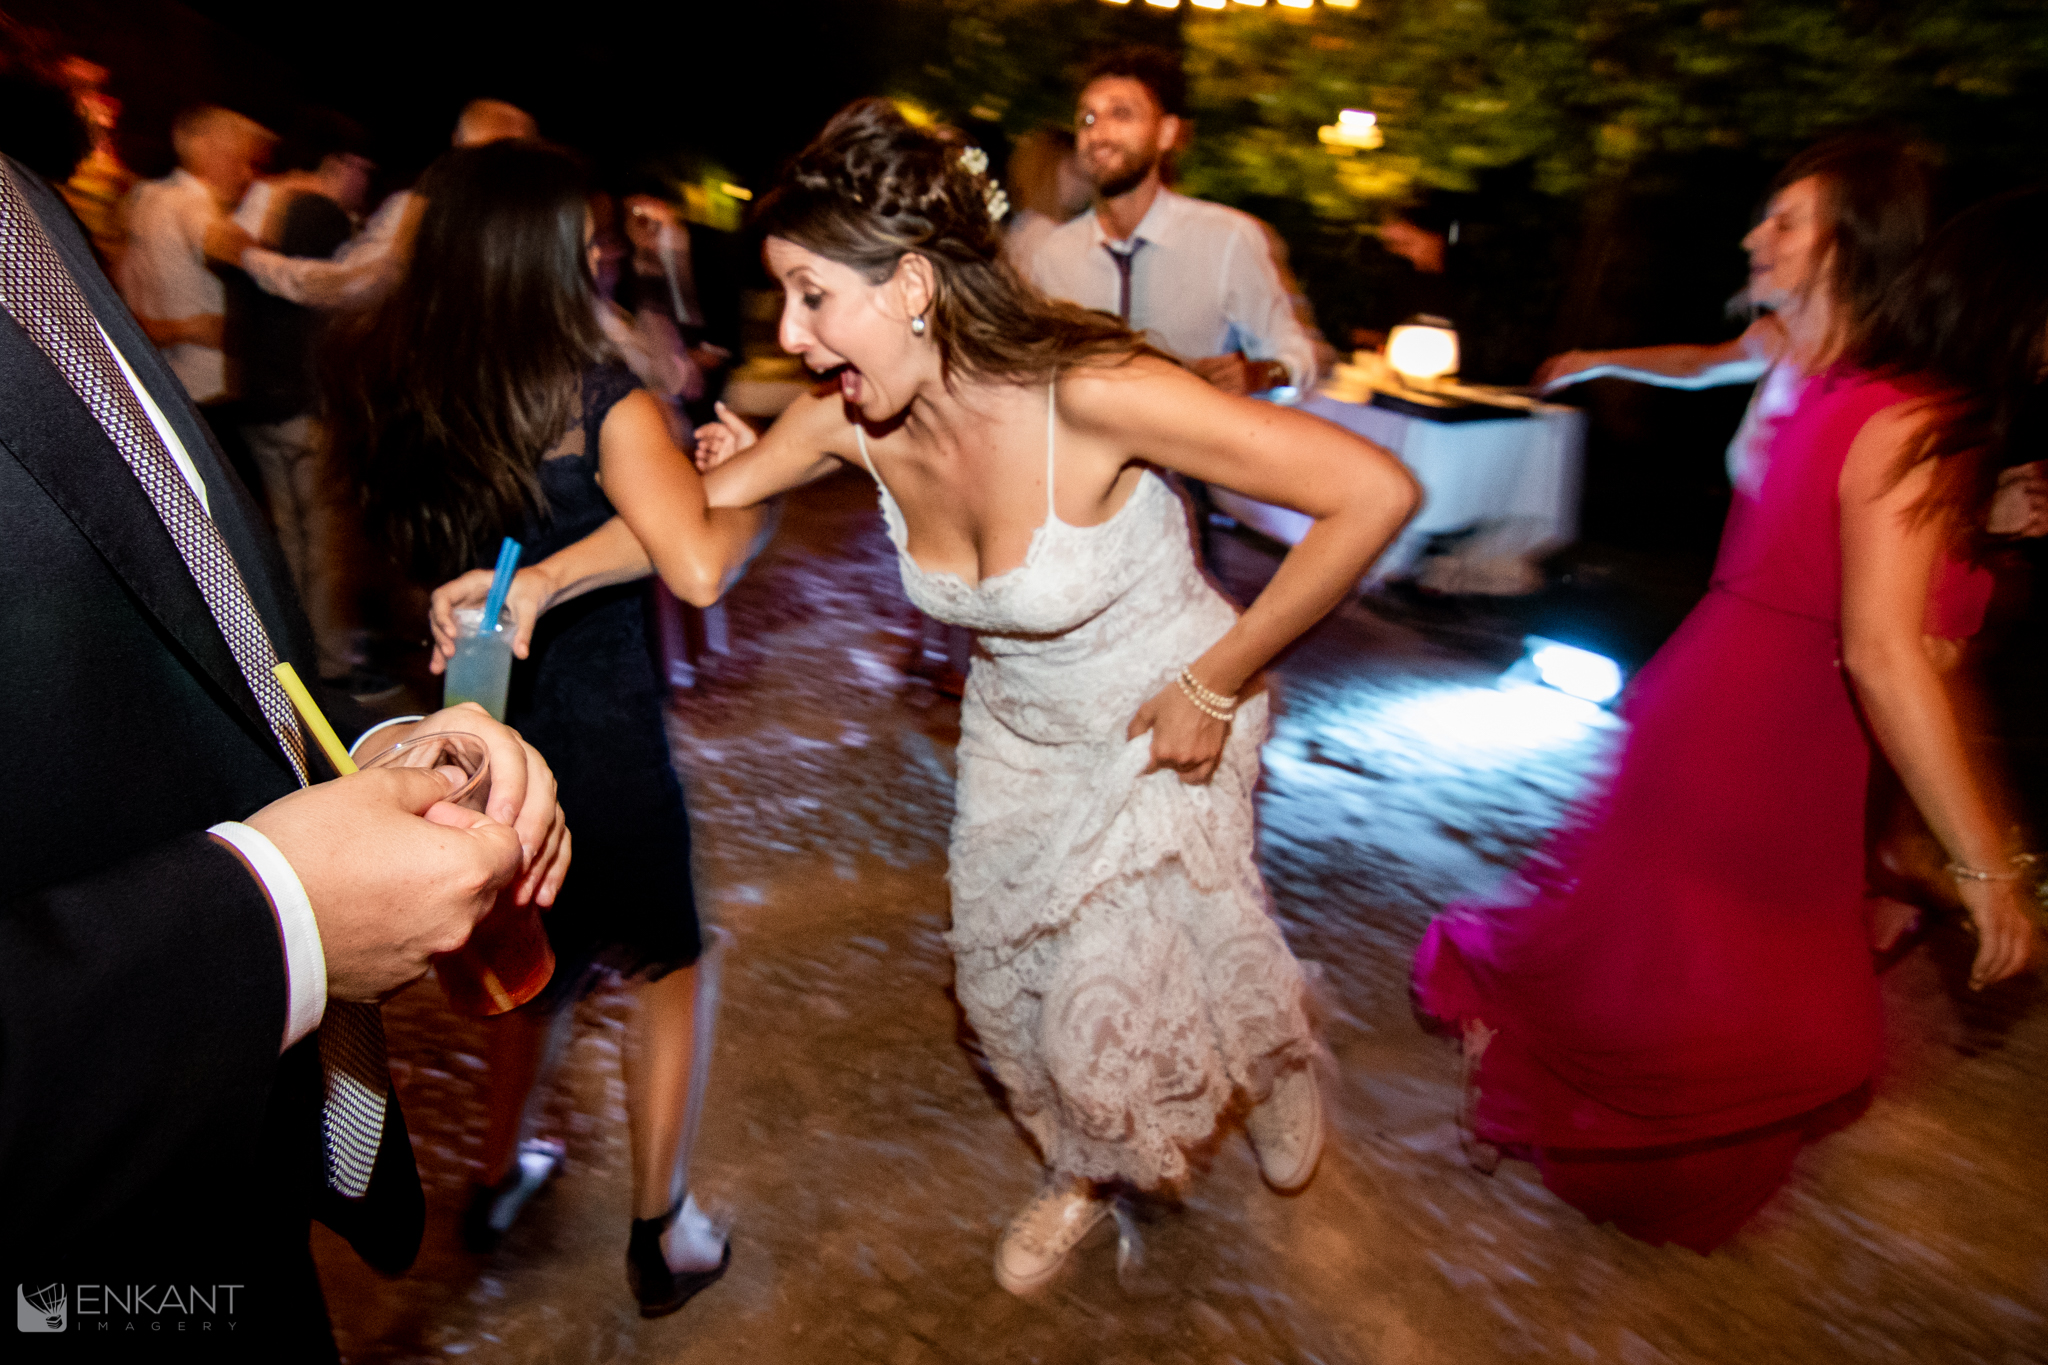 Fotografo matrimonio Sicilia - enkant Imagery-55.jpg